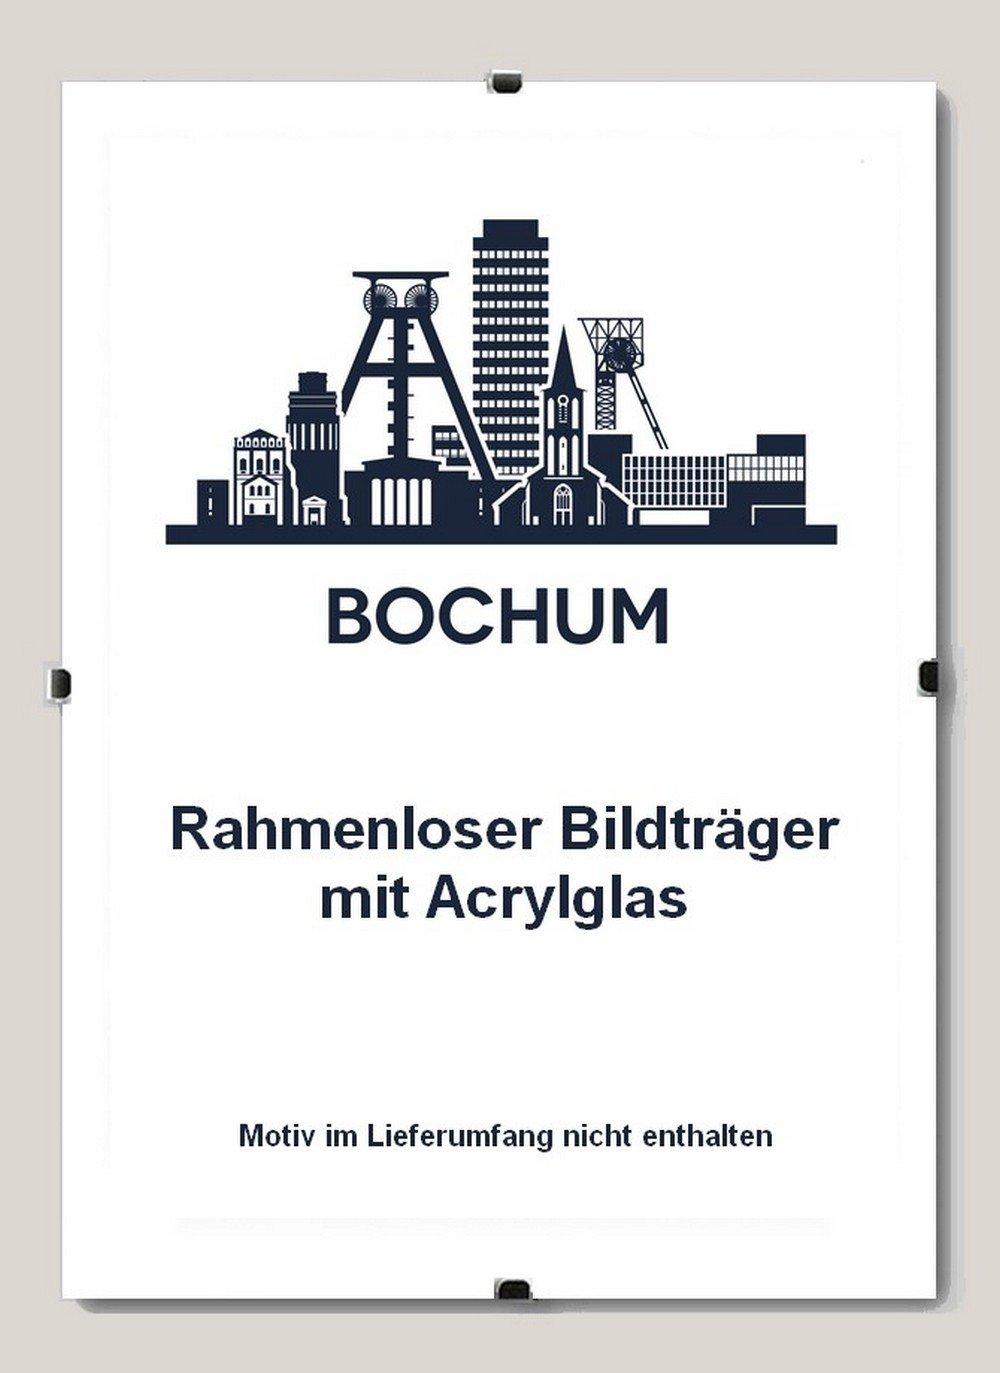 3 Bildhalter Rahmenlos Bochum 60 x 85 cm Bildträger Cliprahmen 85 x 60 cm (Stückpreis nur 17,44 € ) hier  mit Acrylglas klar 1 mm